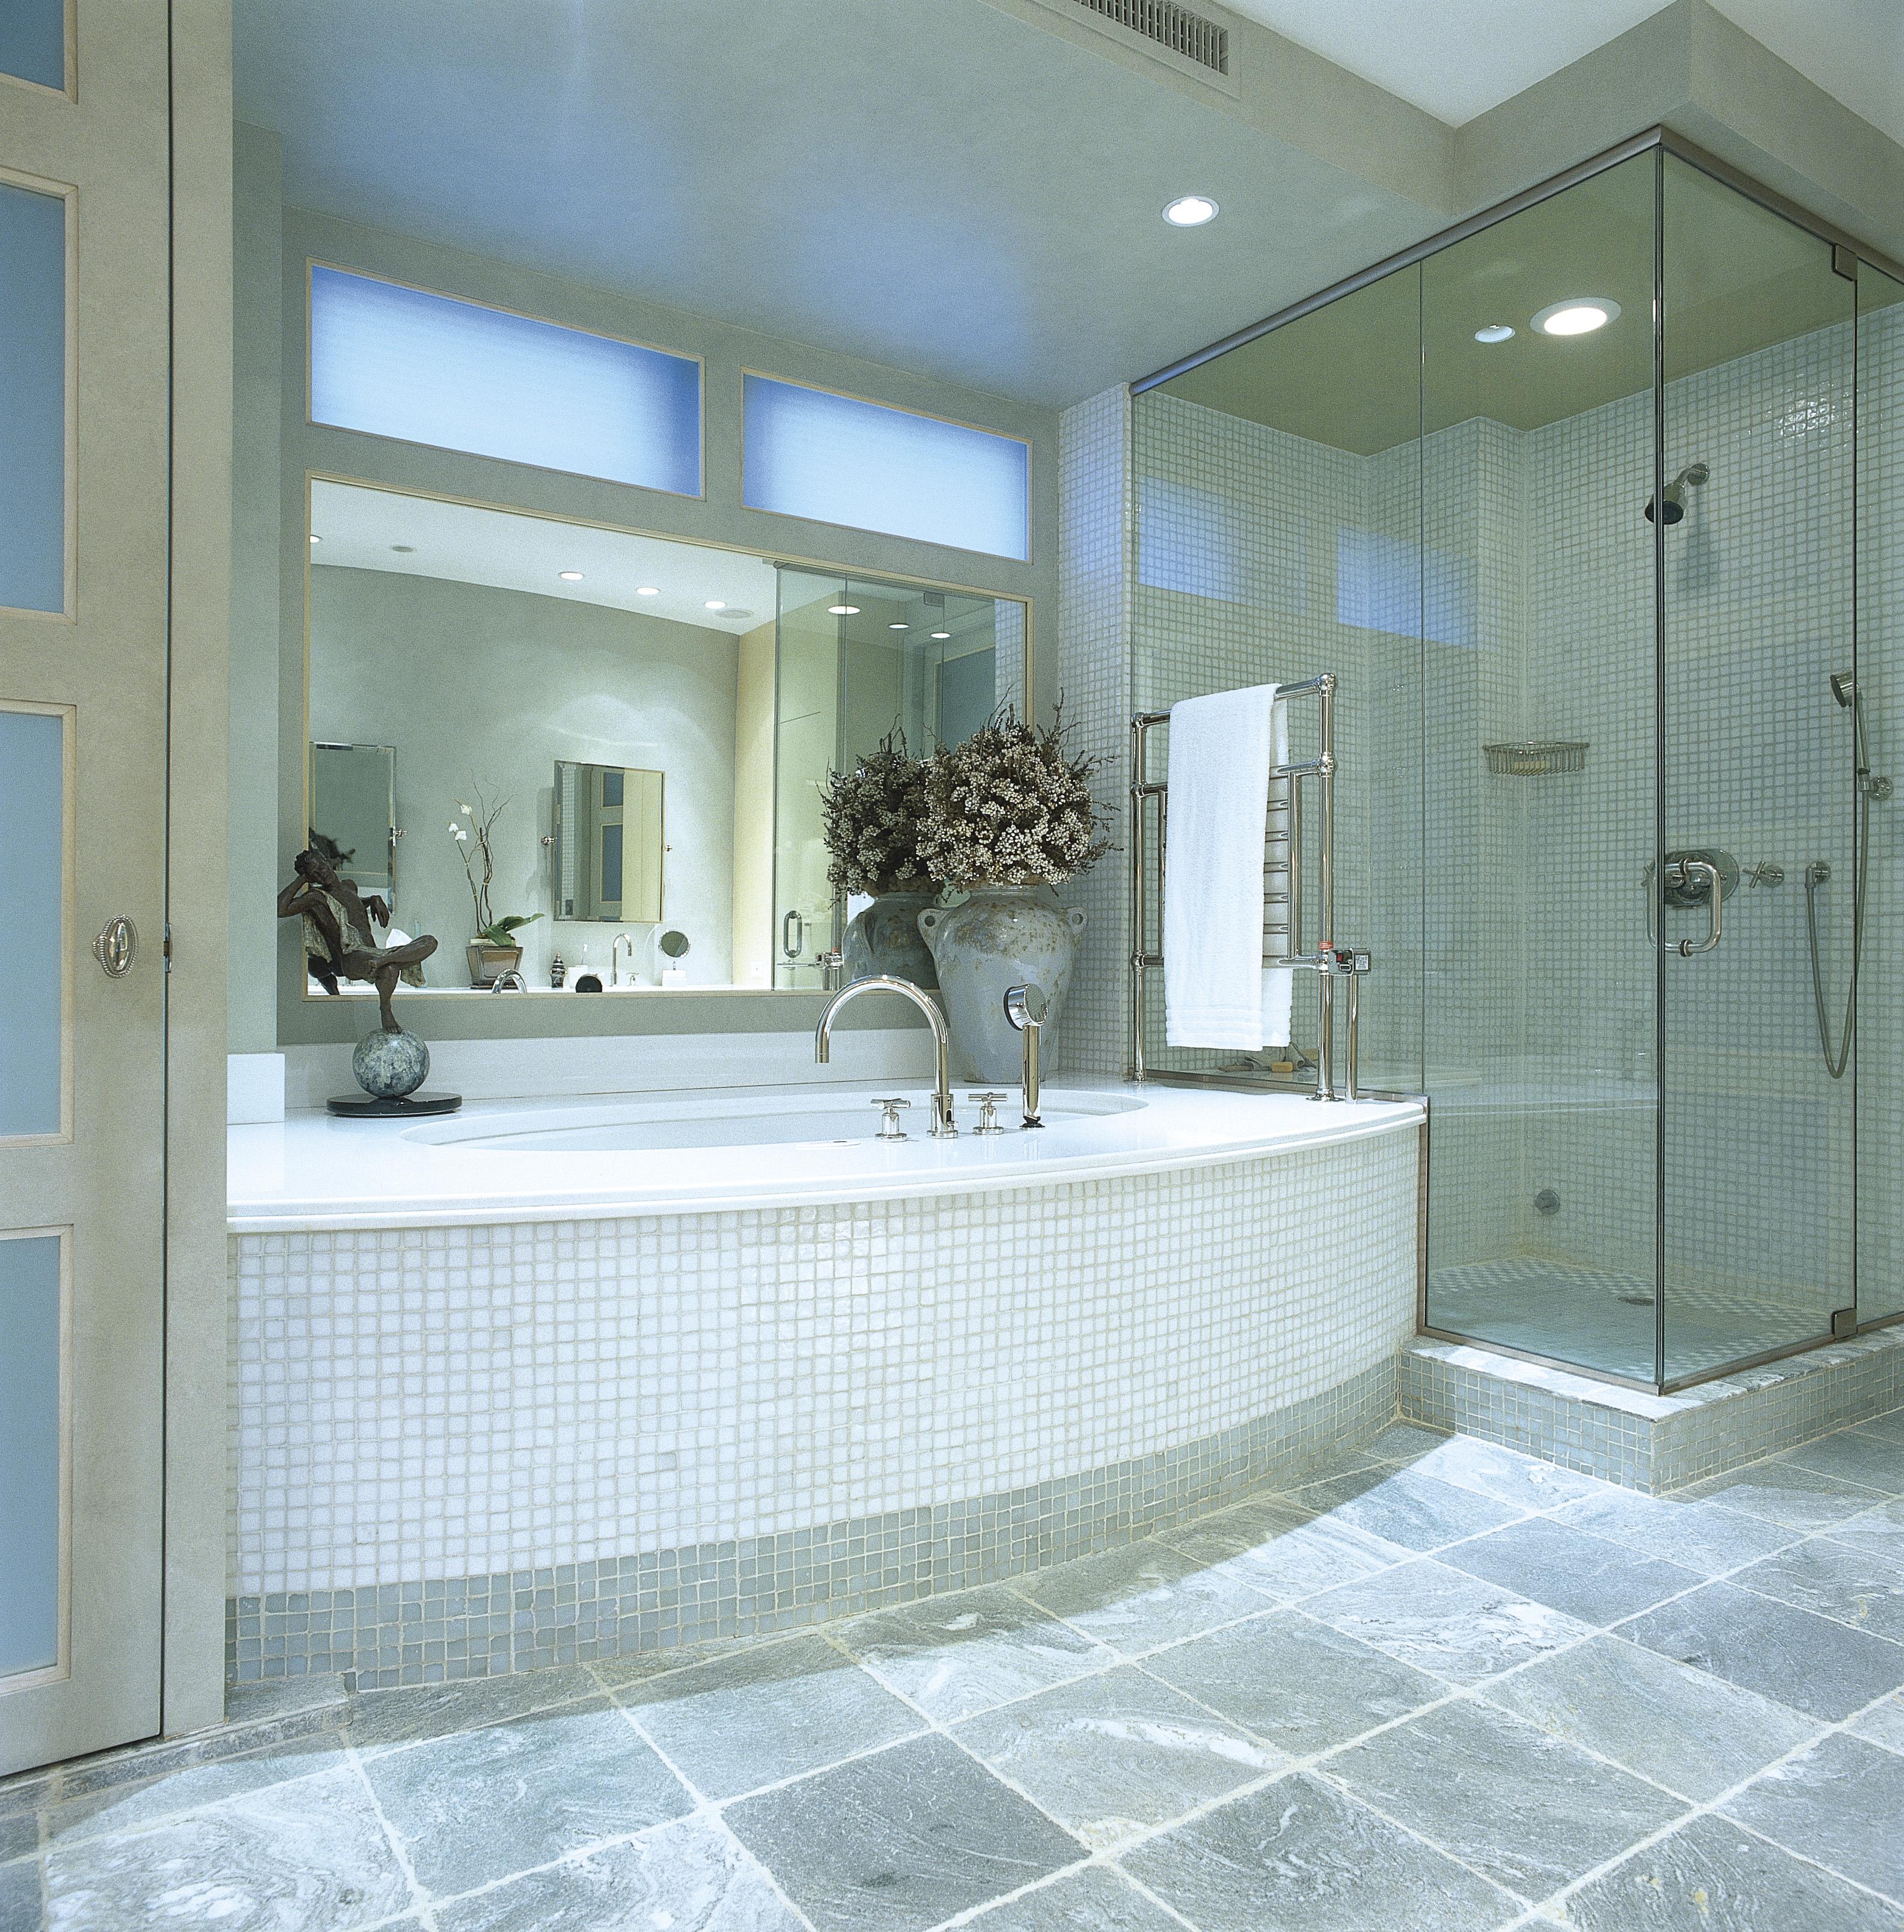 Artistic Glass Floor Tile Bathroom